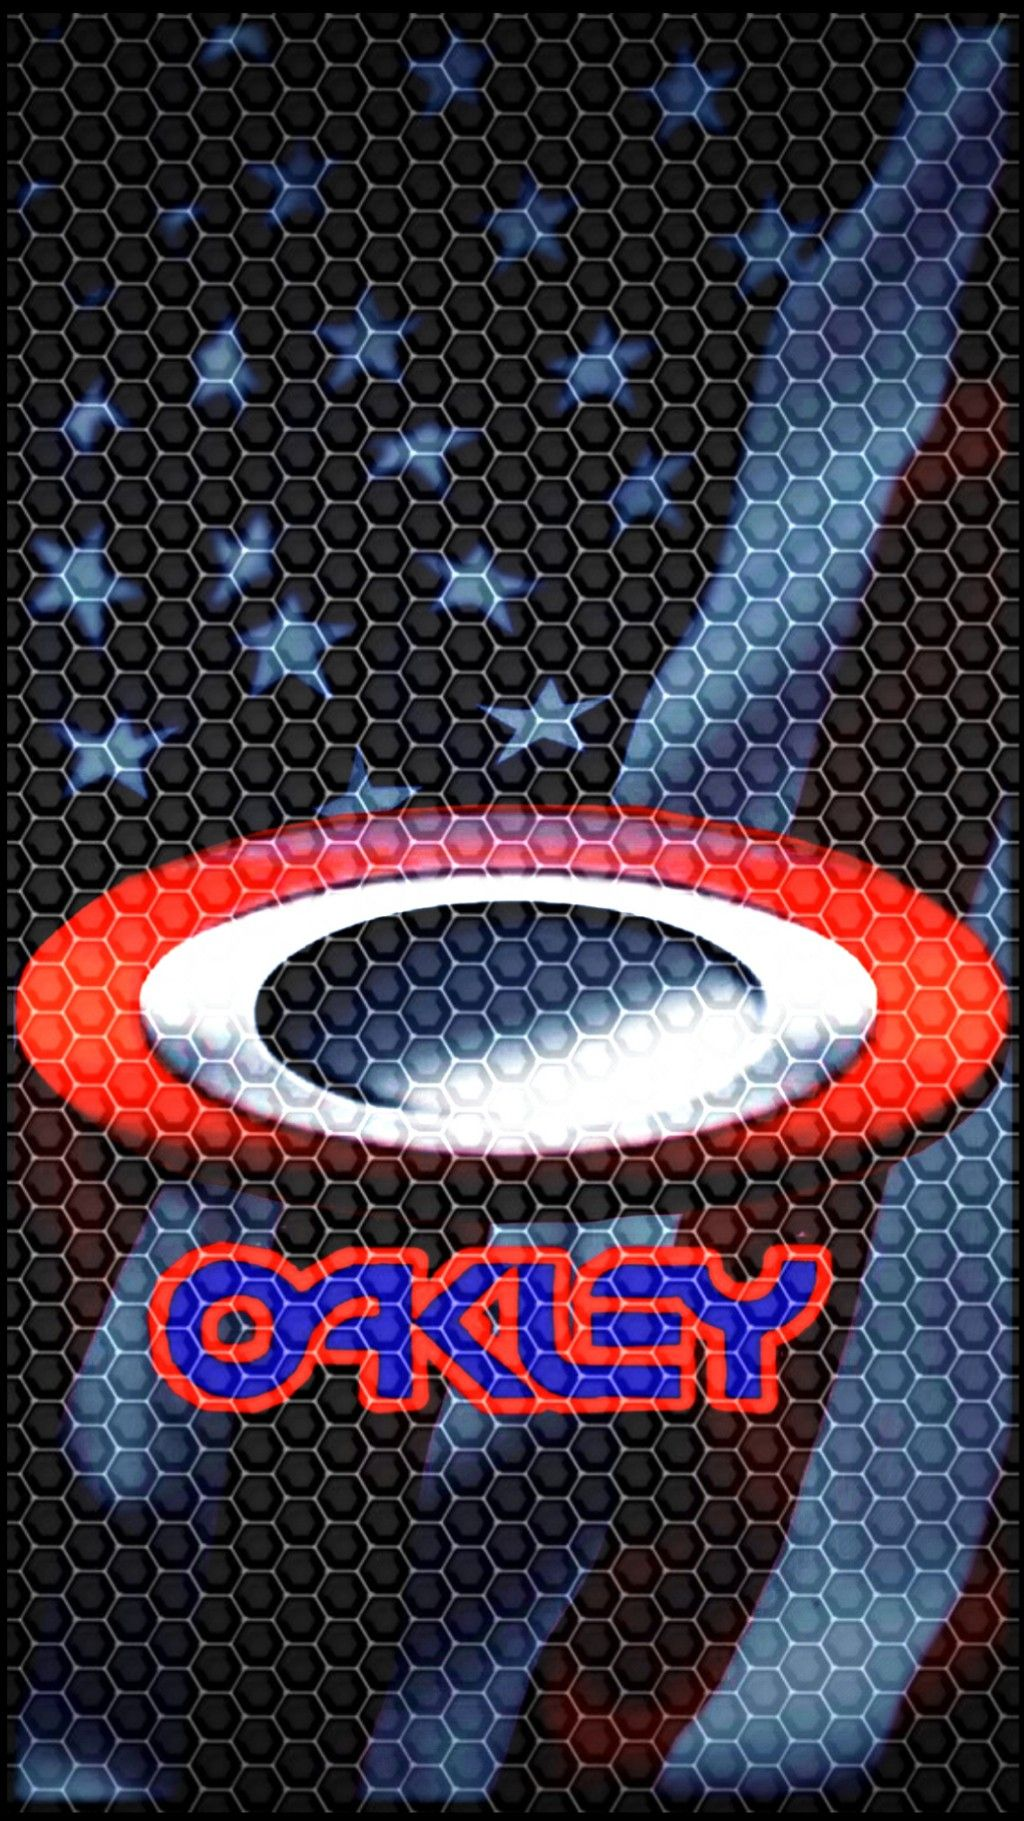 Pin de Nick em Oakley Wallpaper Papeis de parede